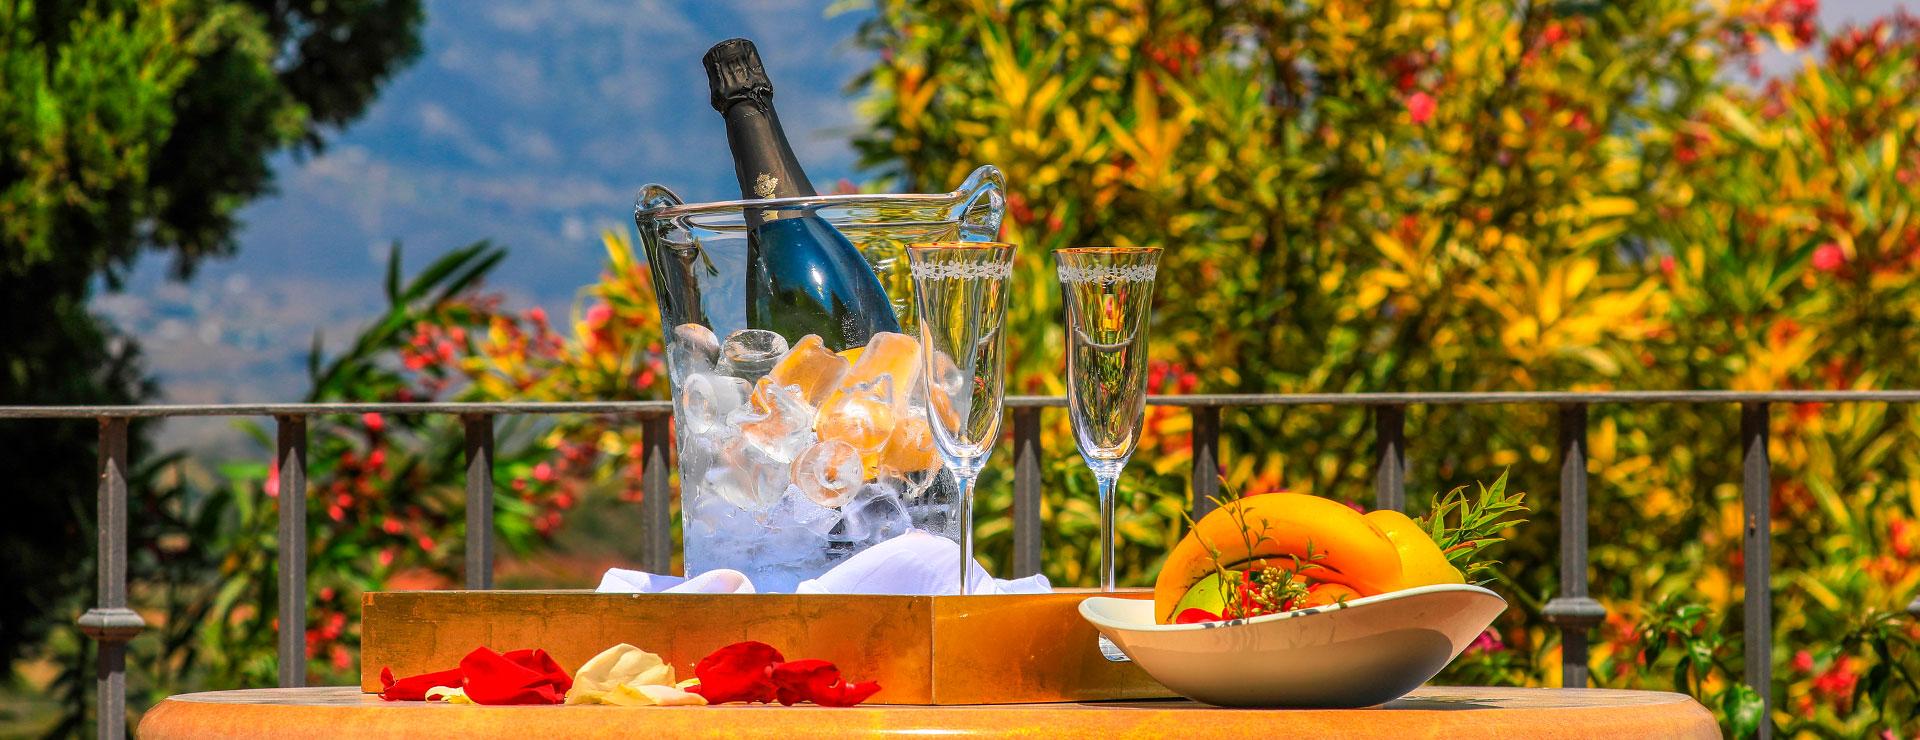 Champagne Hotel - La Cala Resort